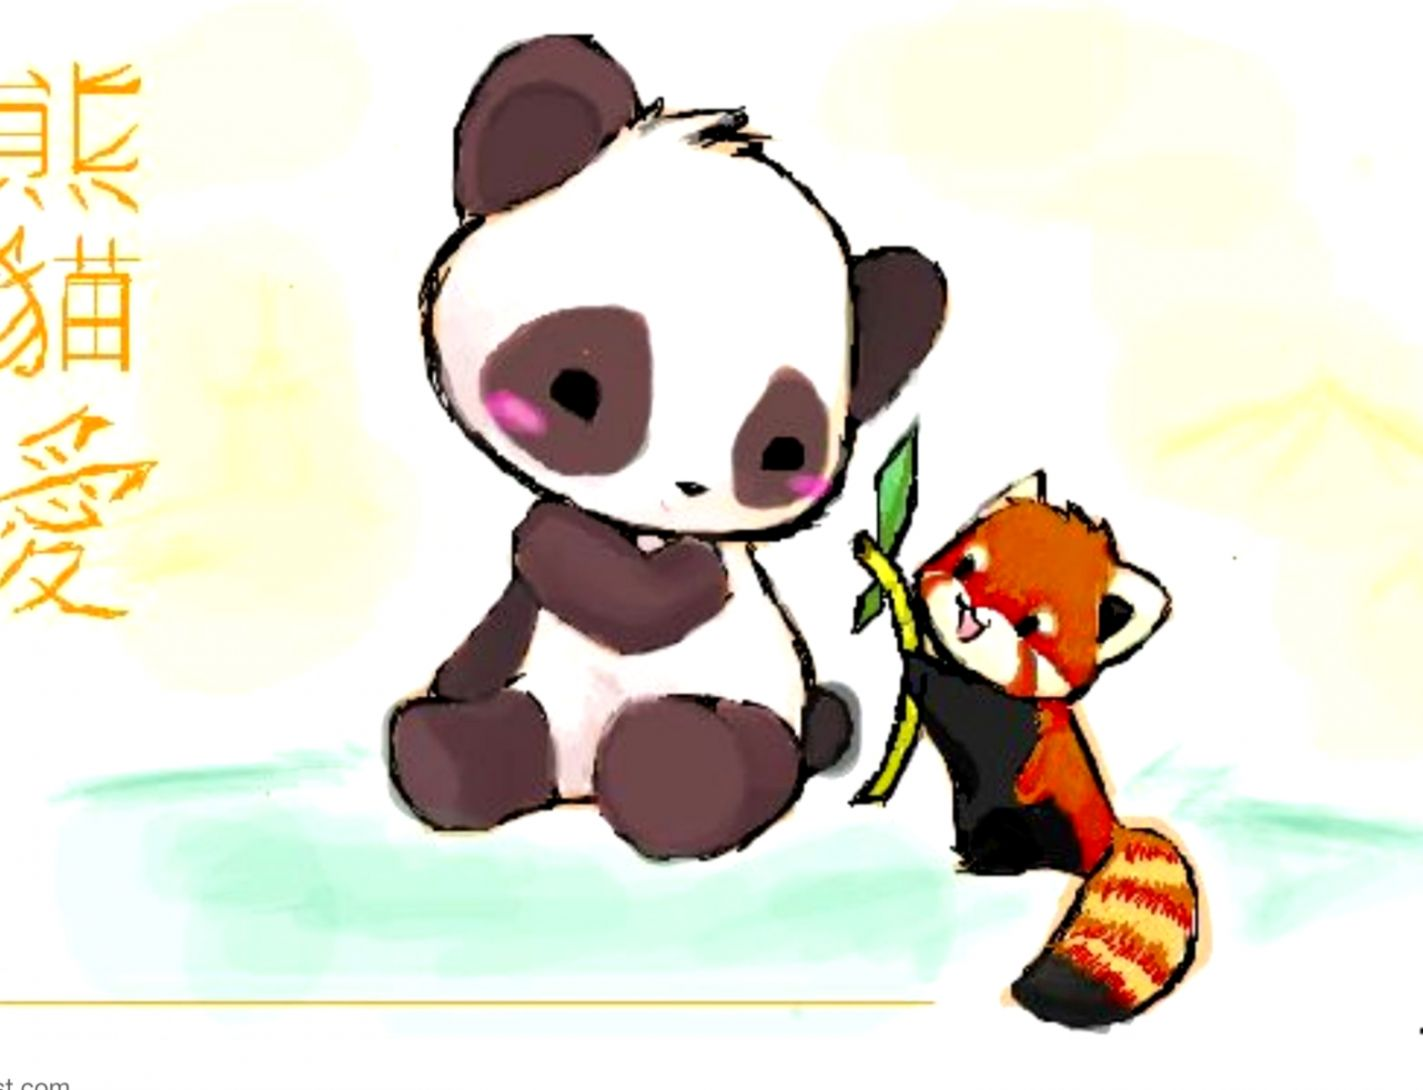 Cute Red Panda Drawing Wallpapers Mhytic